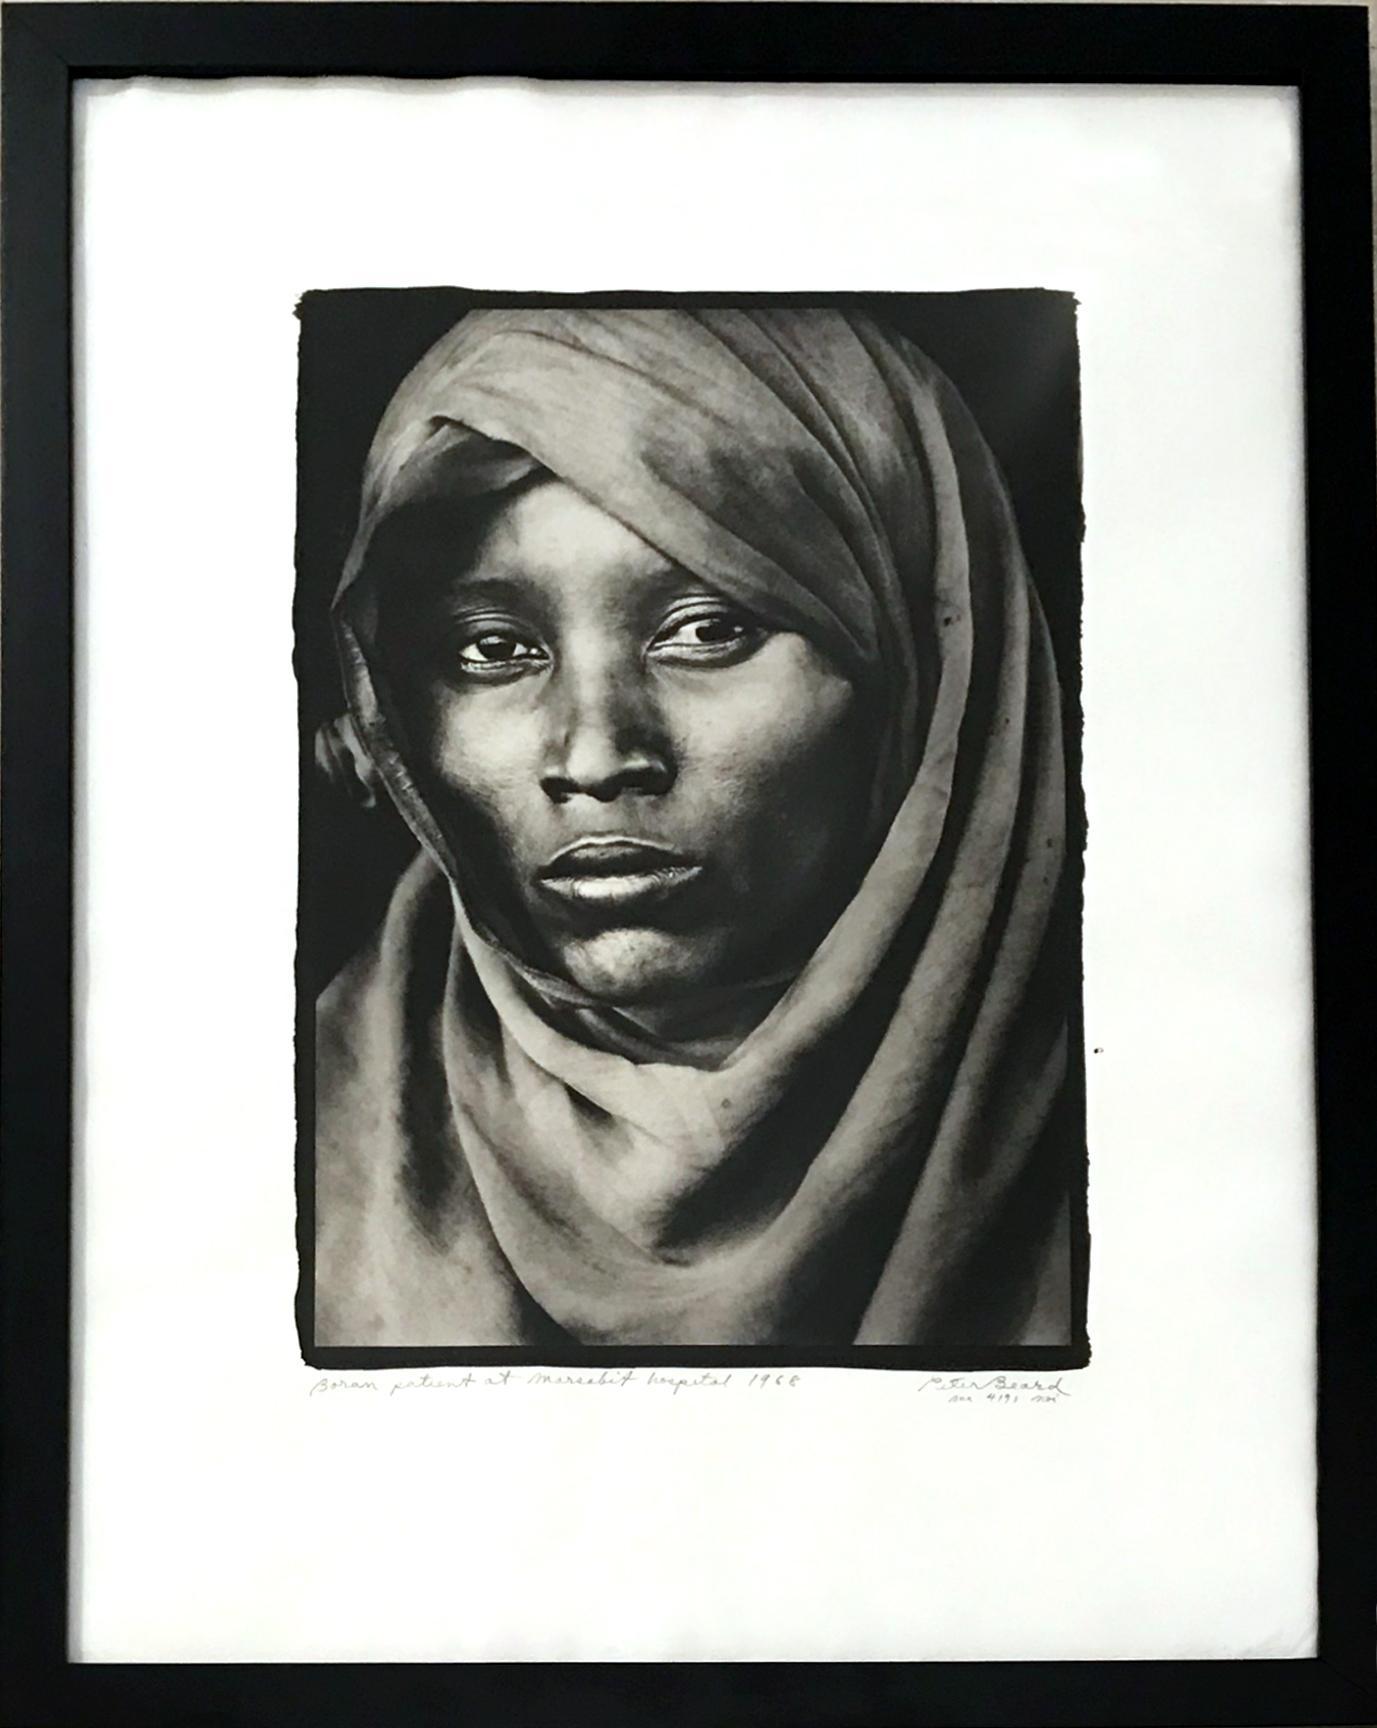 de0c6f333 Fine Art Photography - 49,805 For Sale at 1stdibs